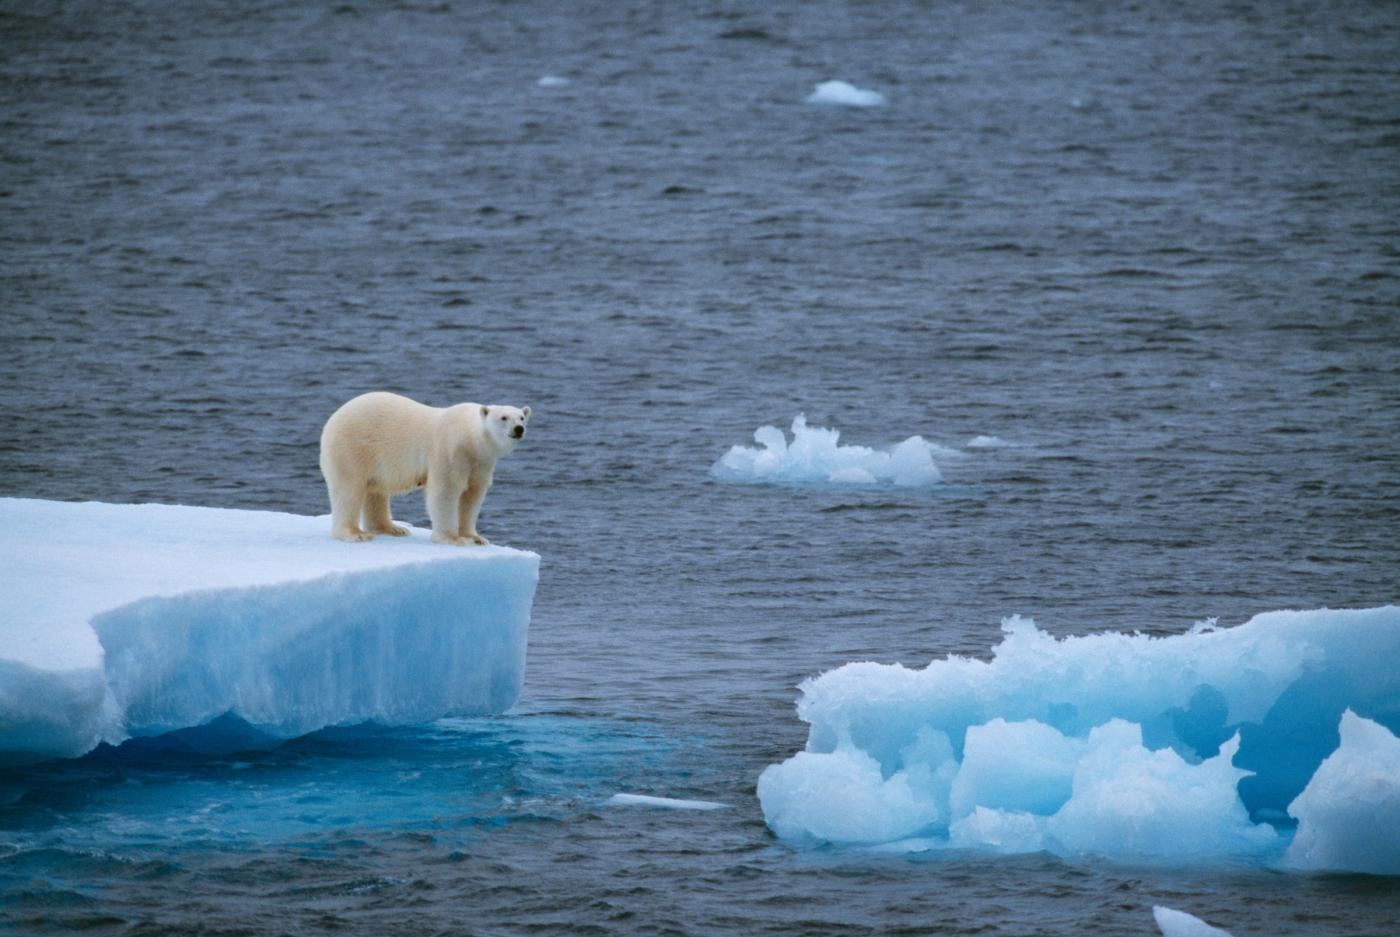 Photo by Staffan Widstrand - Visit Greenland